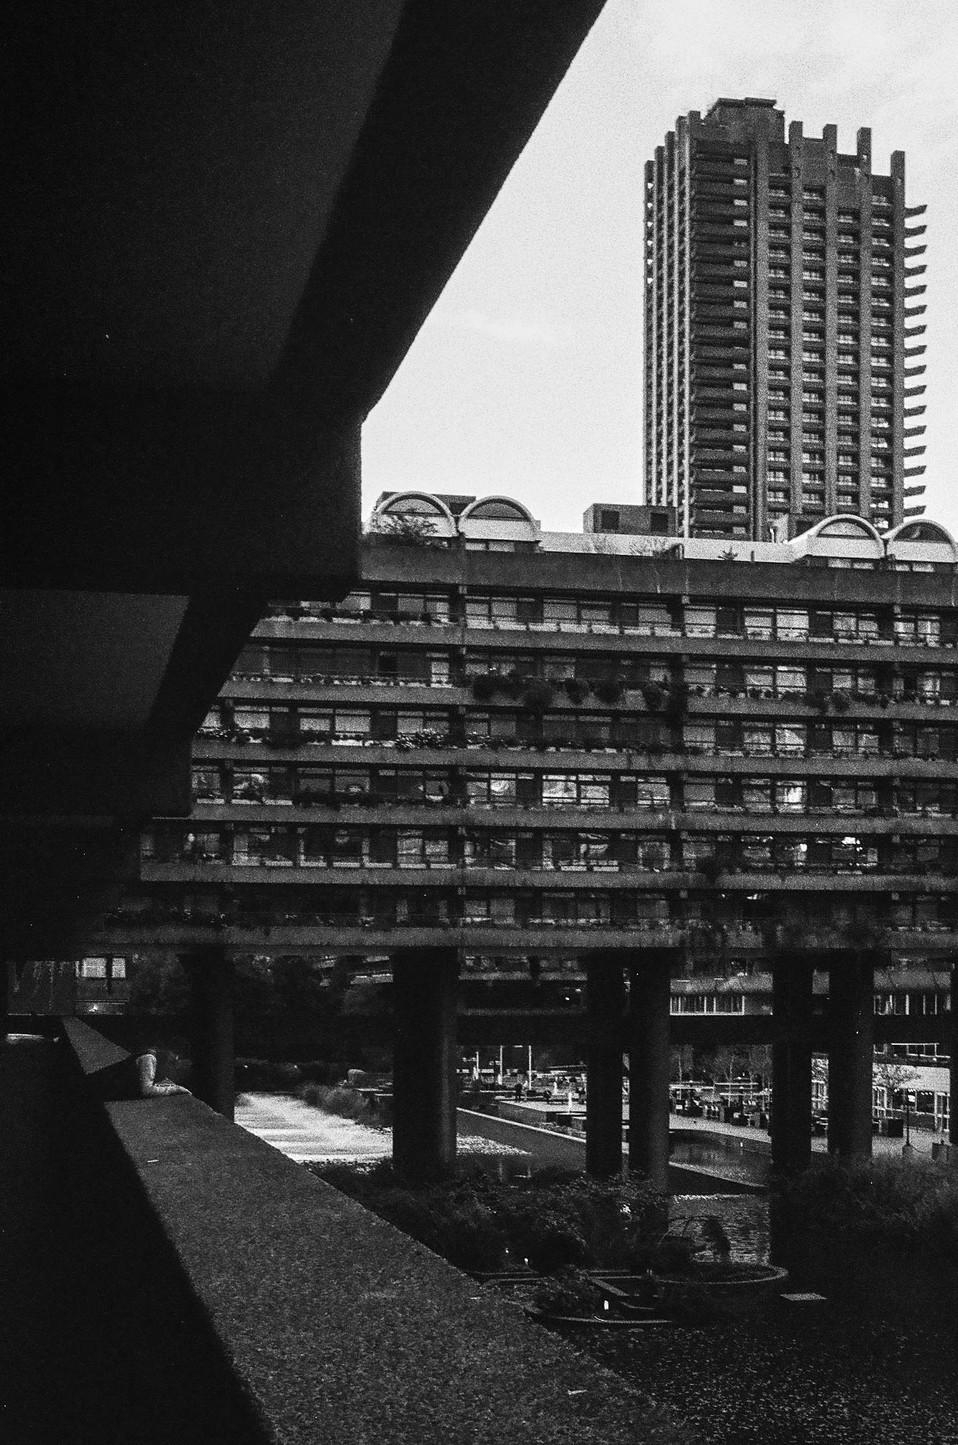 Barbican center (1982) Chamberlin, Powell & Bon  London, England  . Analogic 2017 © Jérémy Pernet